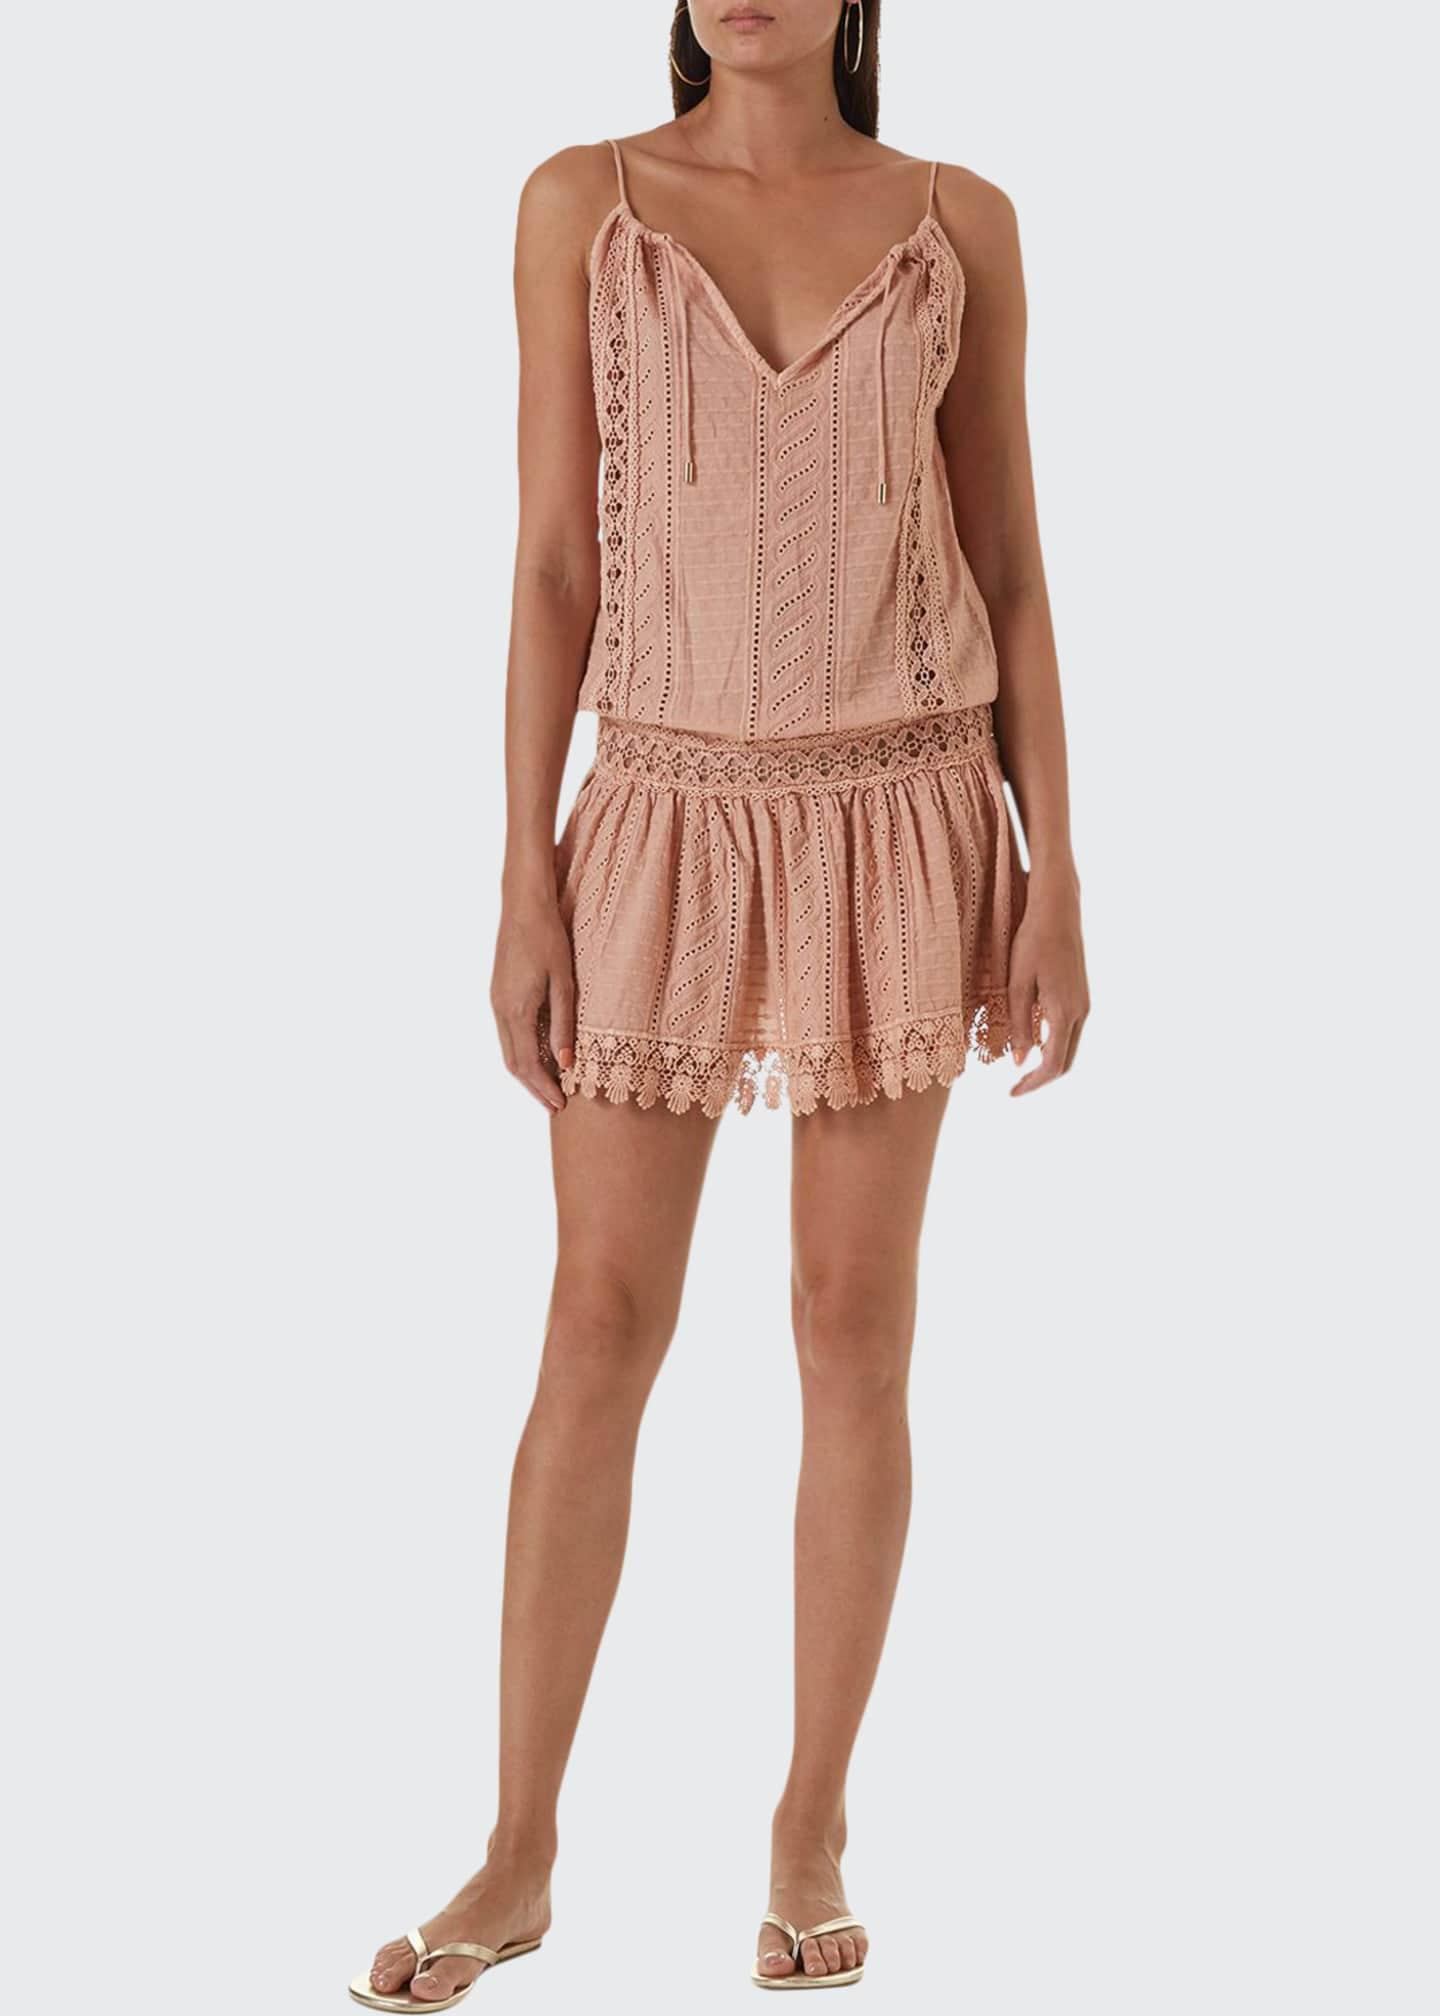 Melissa Odabash Chelsea Eyelet-Lace Halter Dress